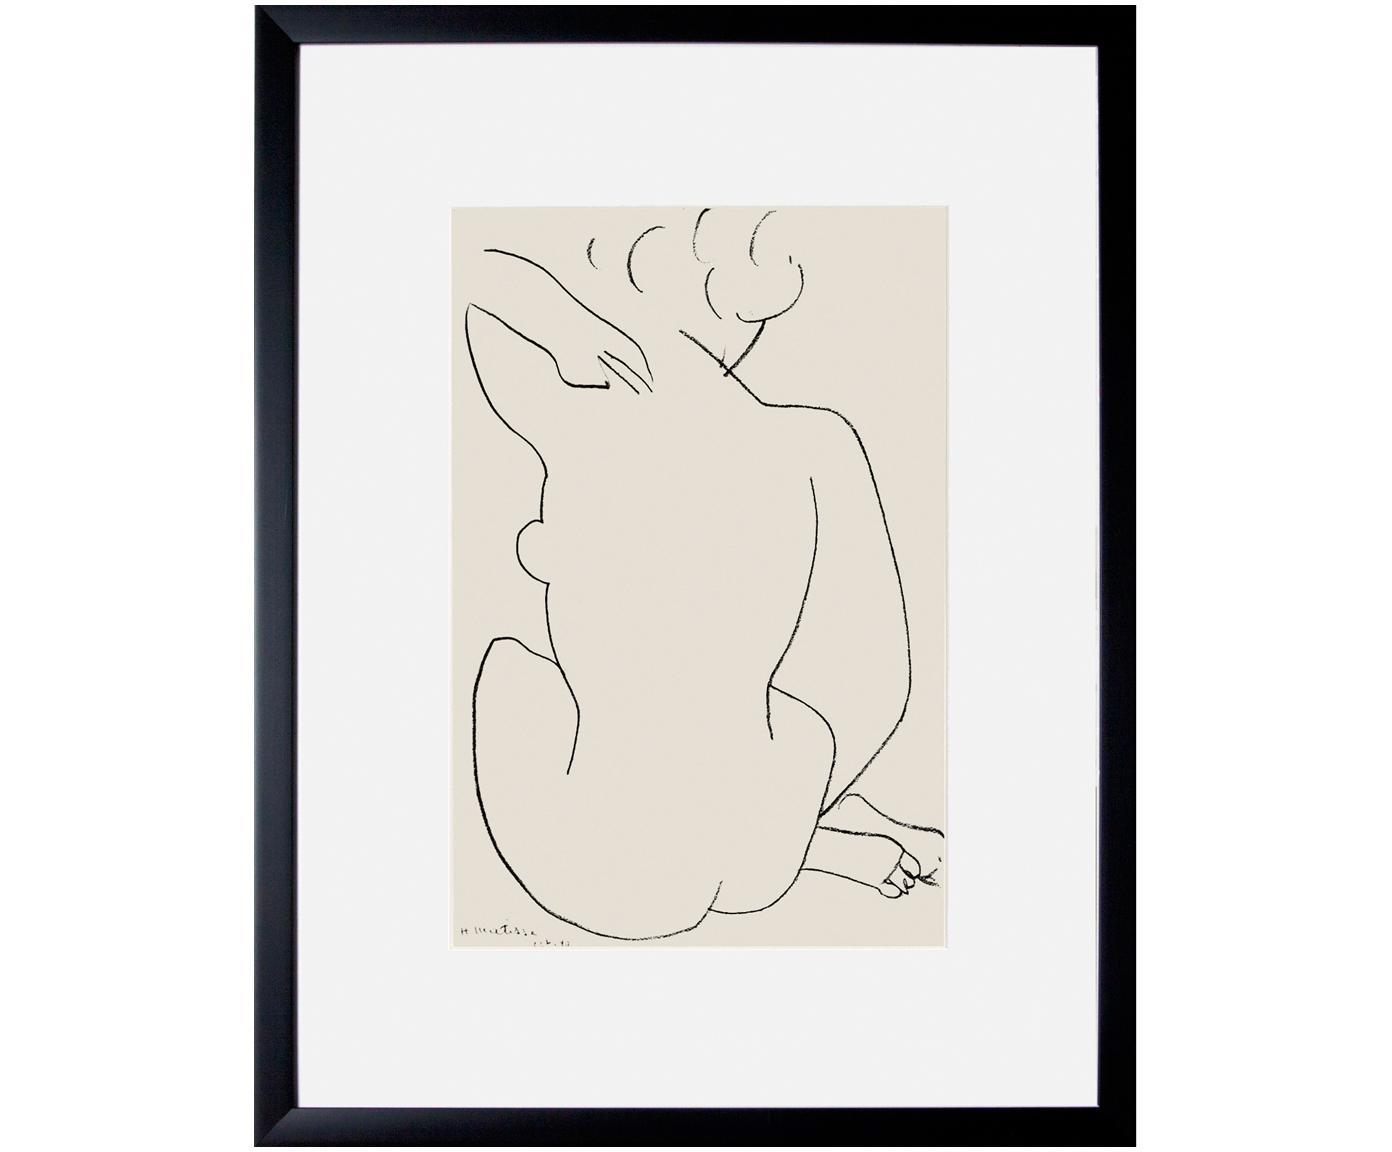 Ingelijste digitale print Matisse: Nu Accroupi, Afbeelding: digitale print, Lijst: kunststoffen frame met gl, Multicolour, 43 x 60 cm